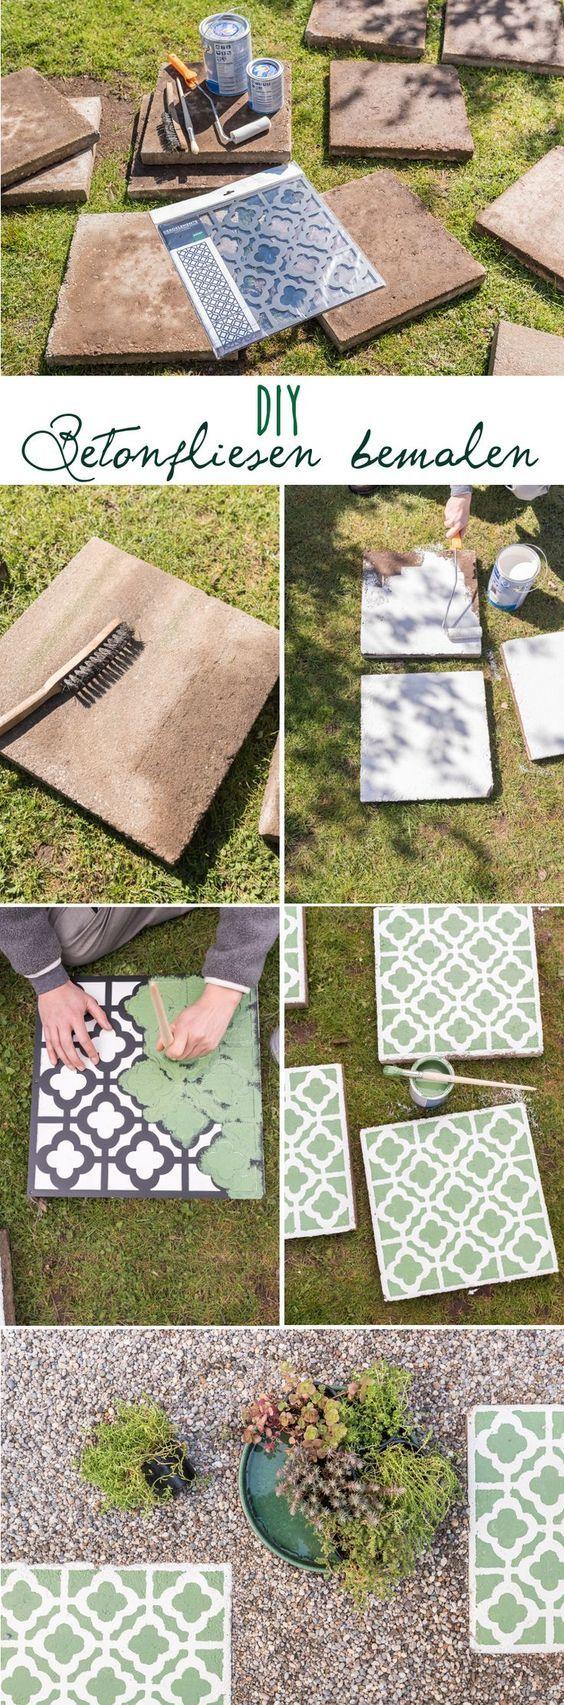 best 20 gehwegplatten ideas on pinterest beton stufen stufen look and sprungbrett gehwege. Black Bedroom Furniture Sets. Home Design Ideas